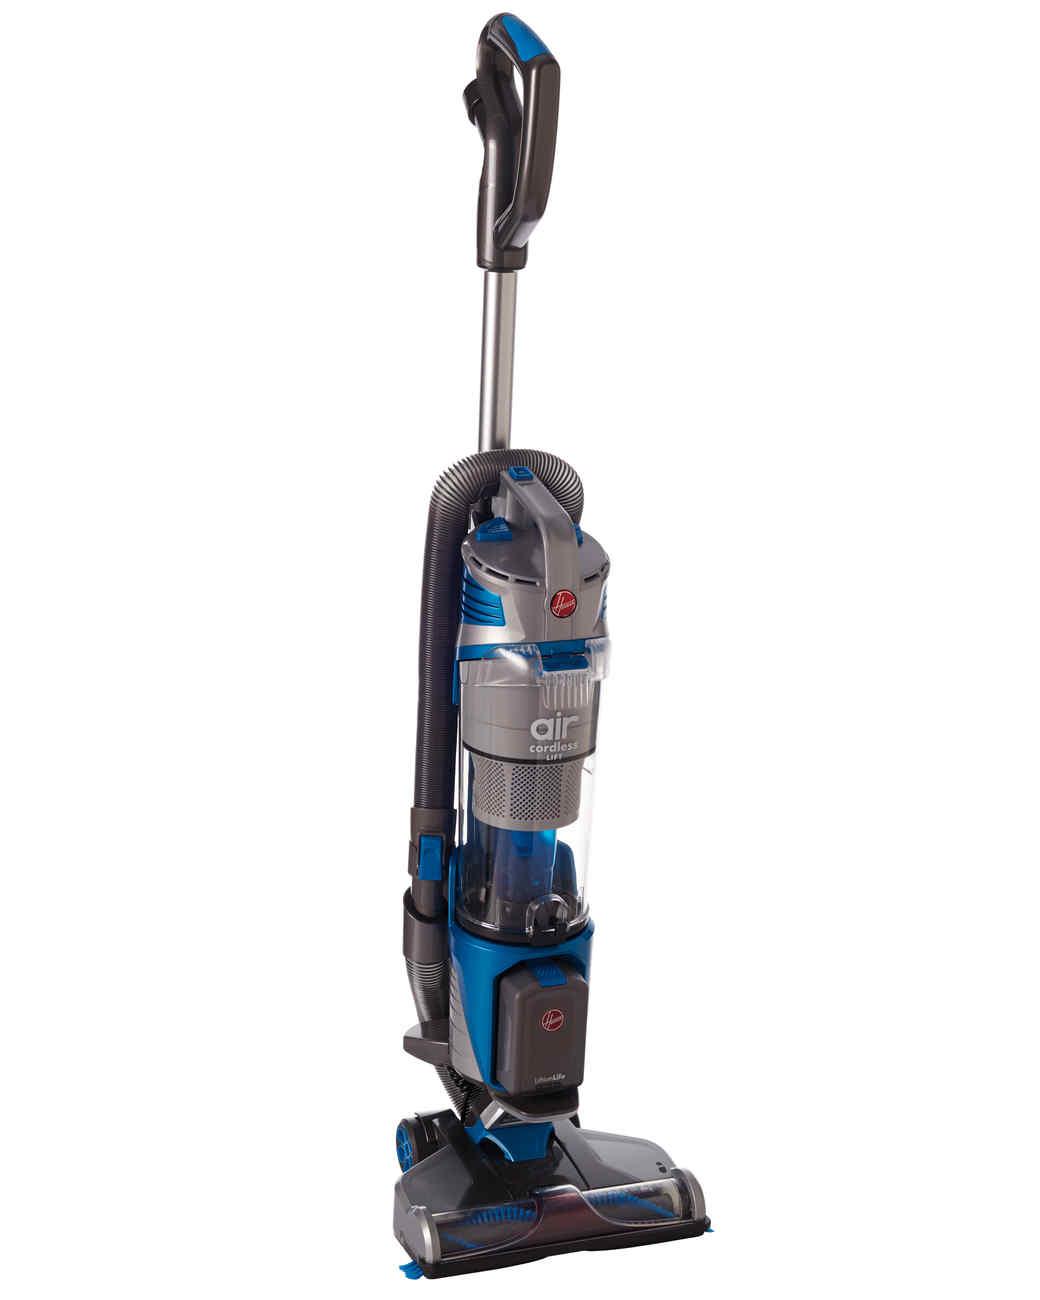 hoover-air-cordless-vacuum-034-d112321.jpg